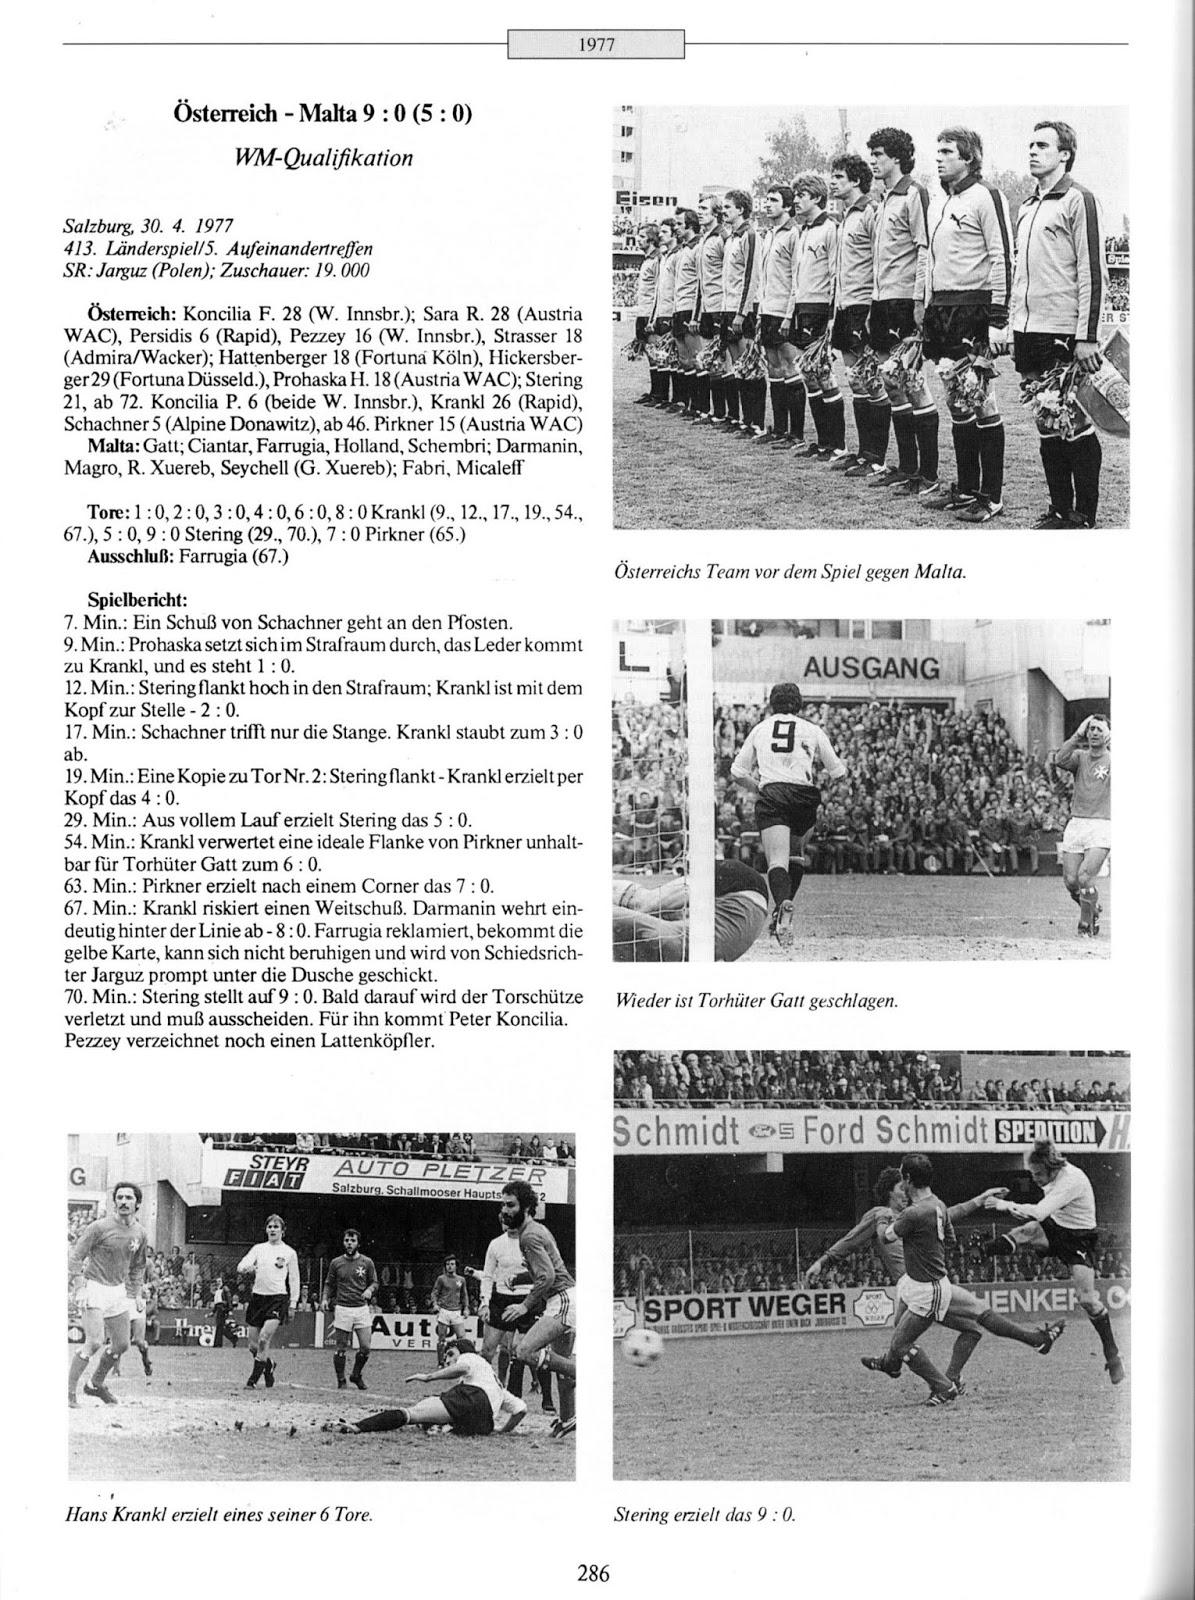 soccer nostalgia international season 1976 77, part 10  fu%c3%83%c2%9fball torwart c 8 #4